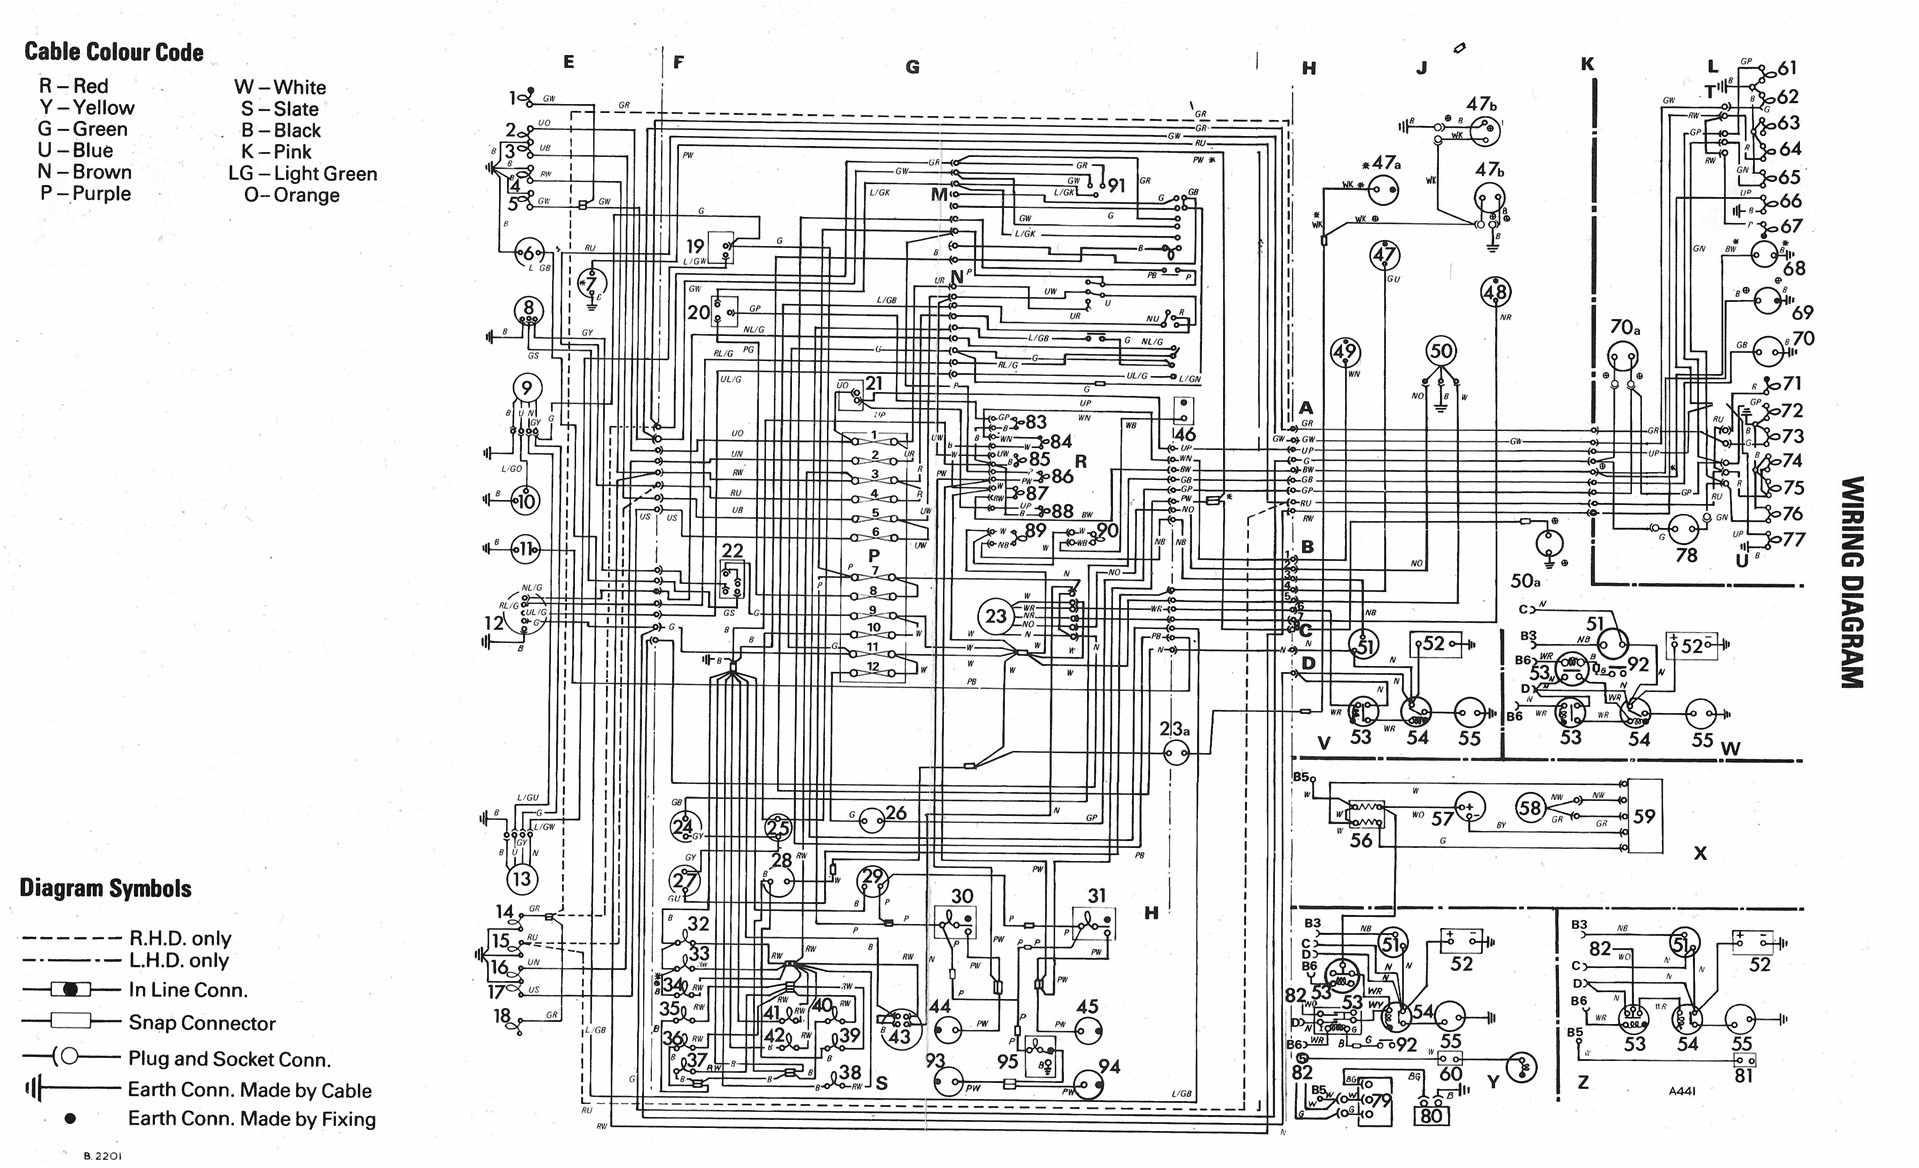 vw golf mk6 stereo wiring diagram